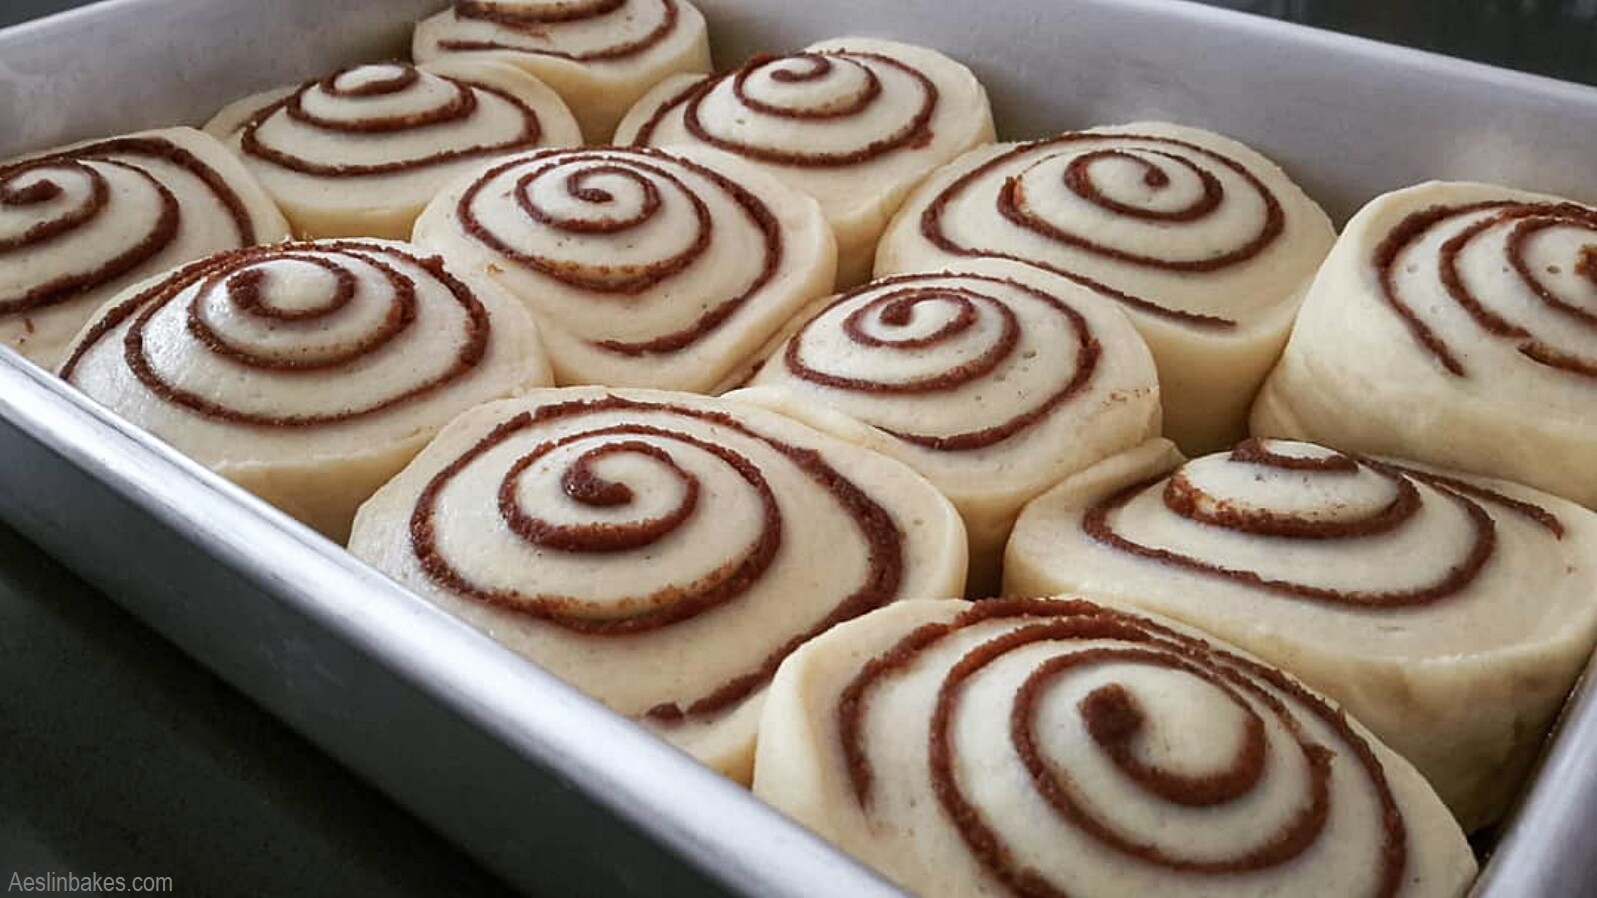 9x13 inch pan of cinnamon rolls